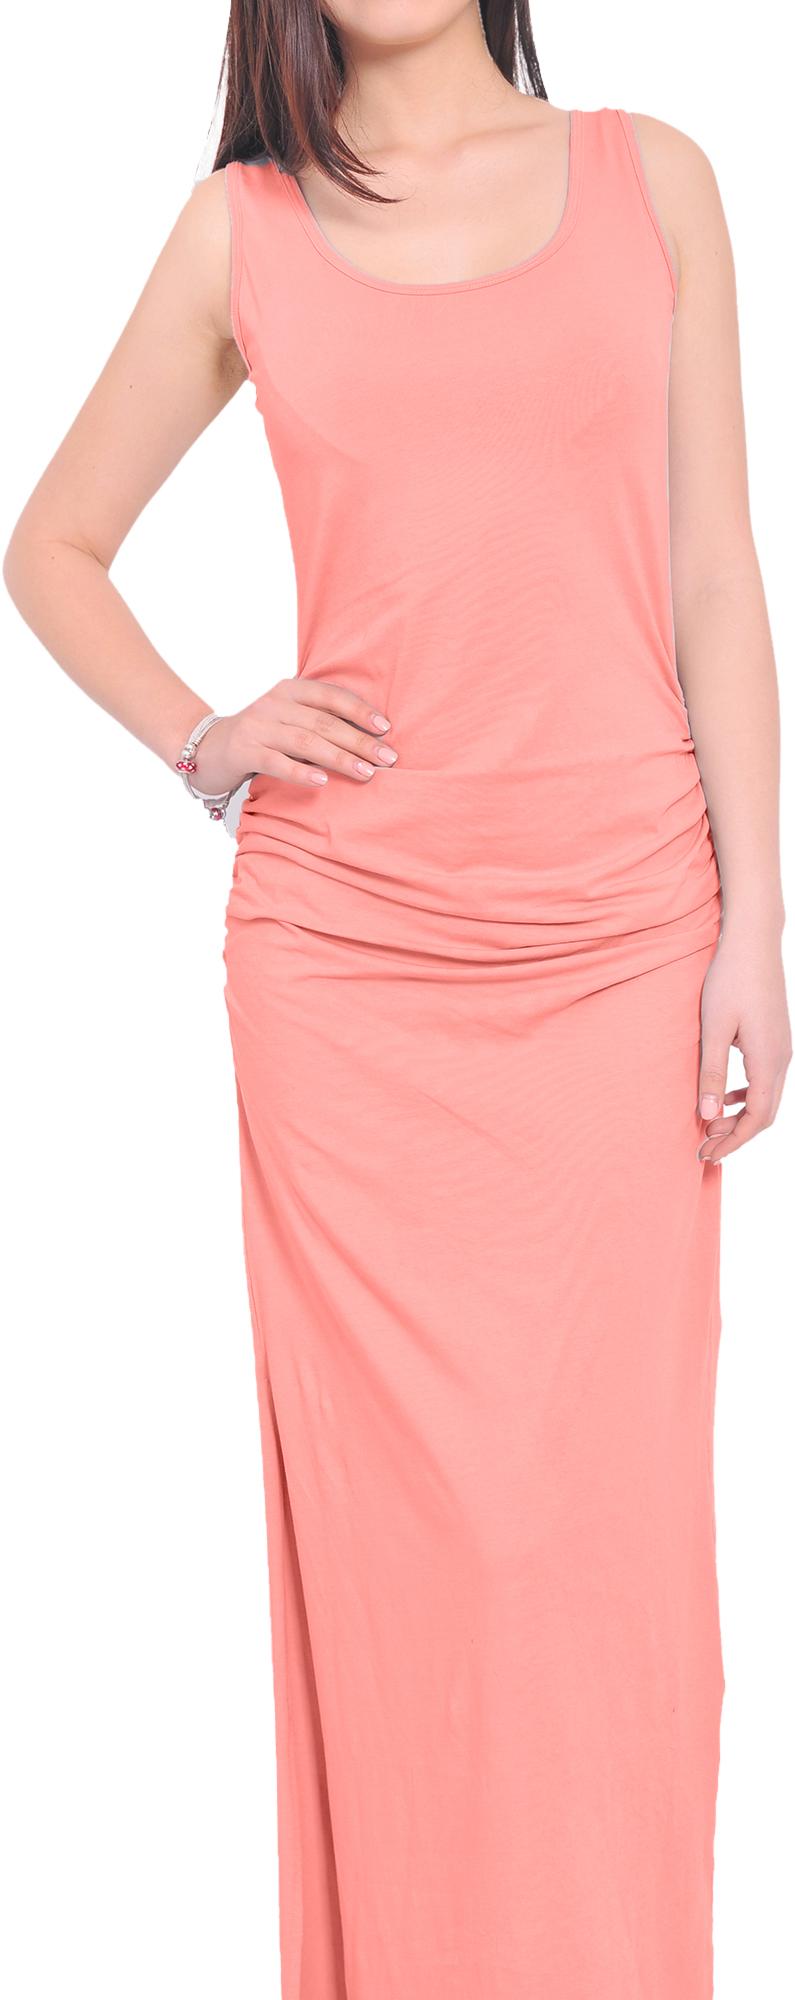 womens summer resort sleeveless ruched maxi